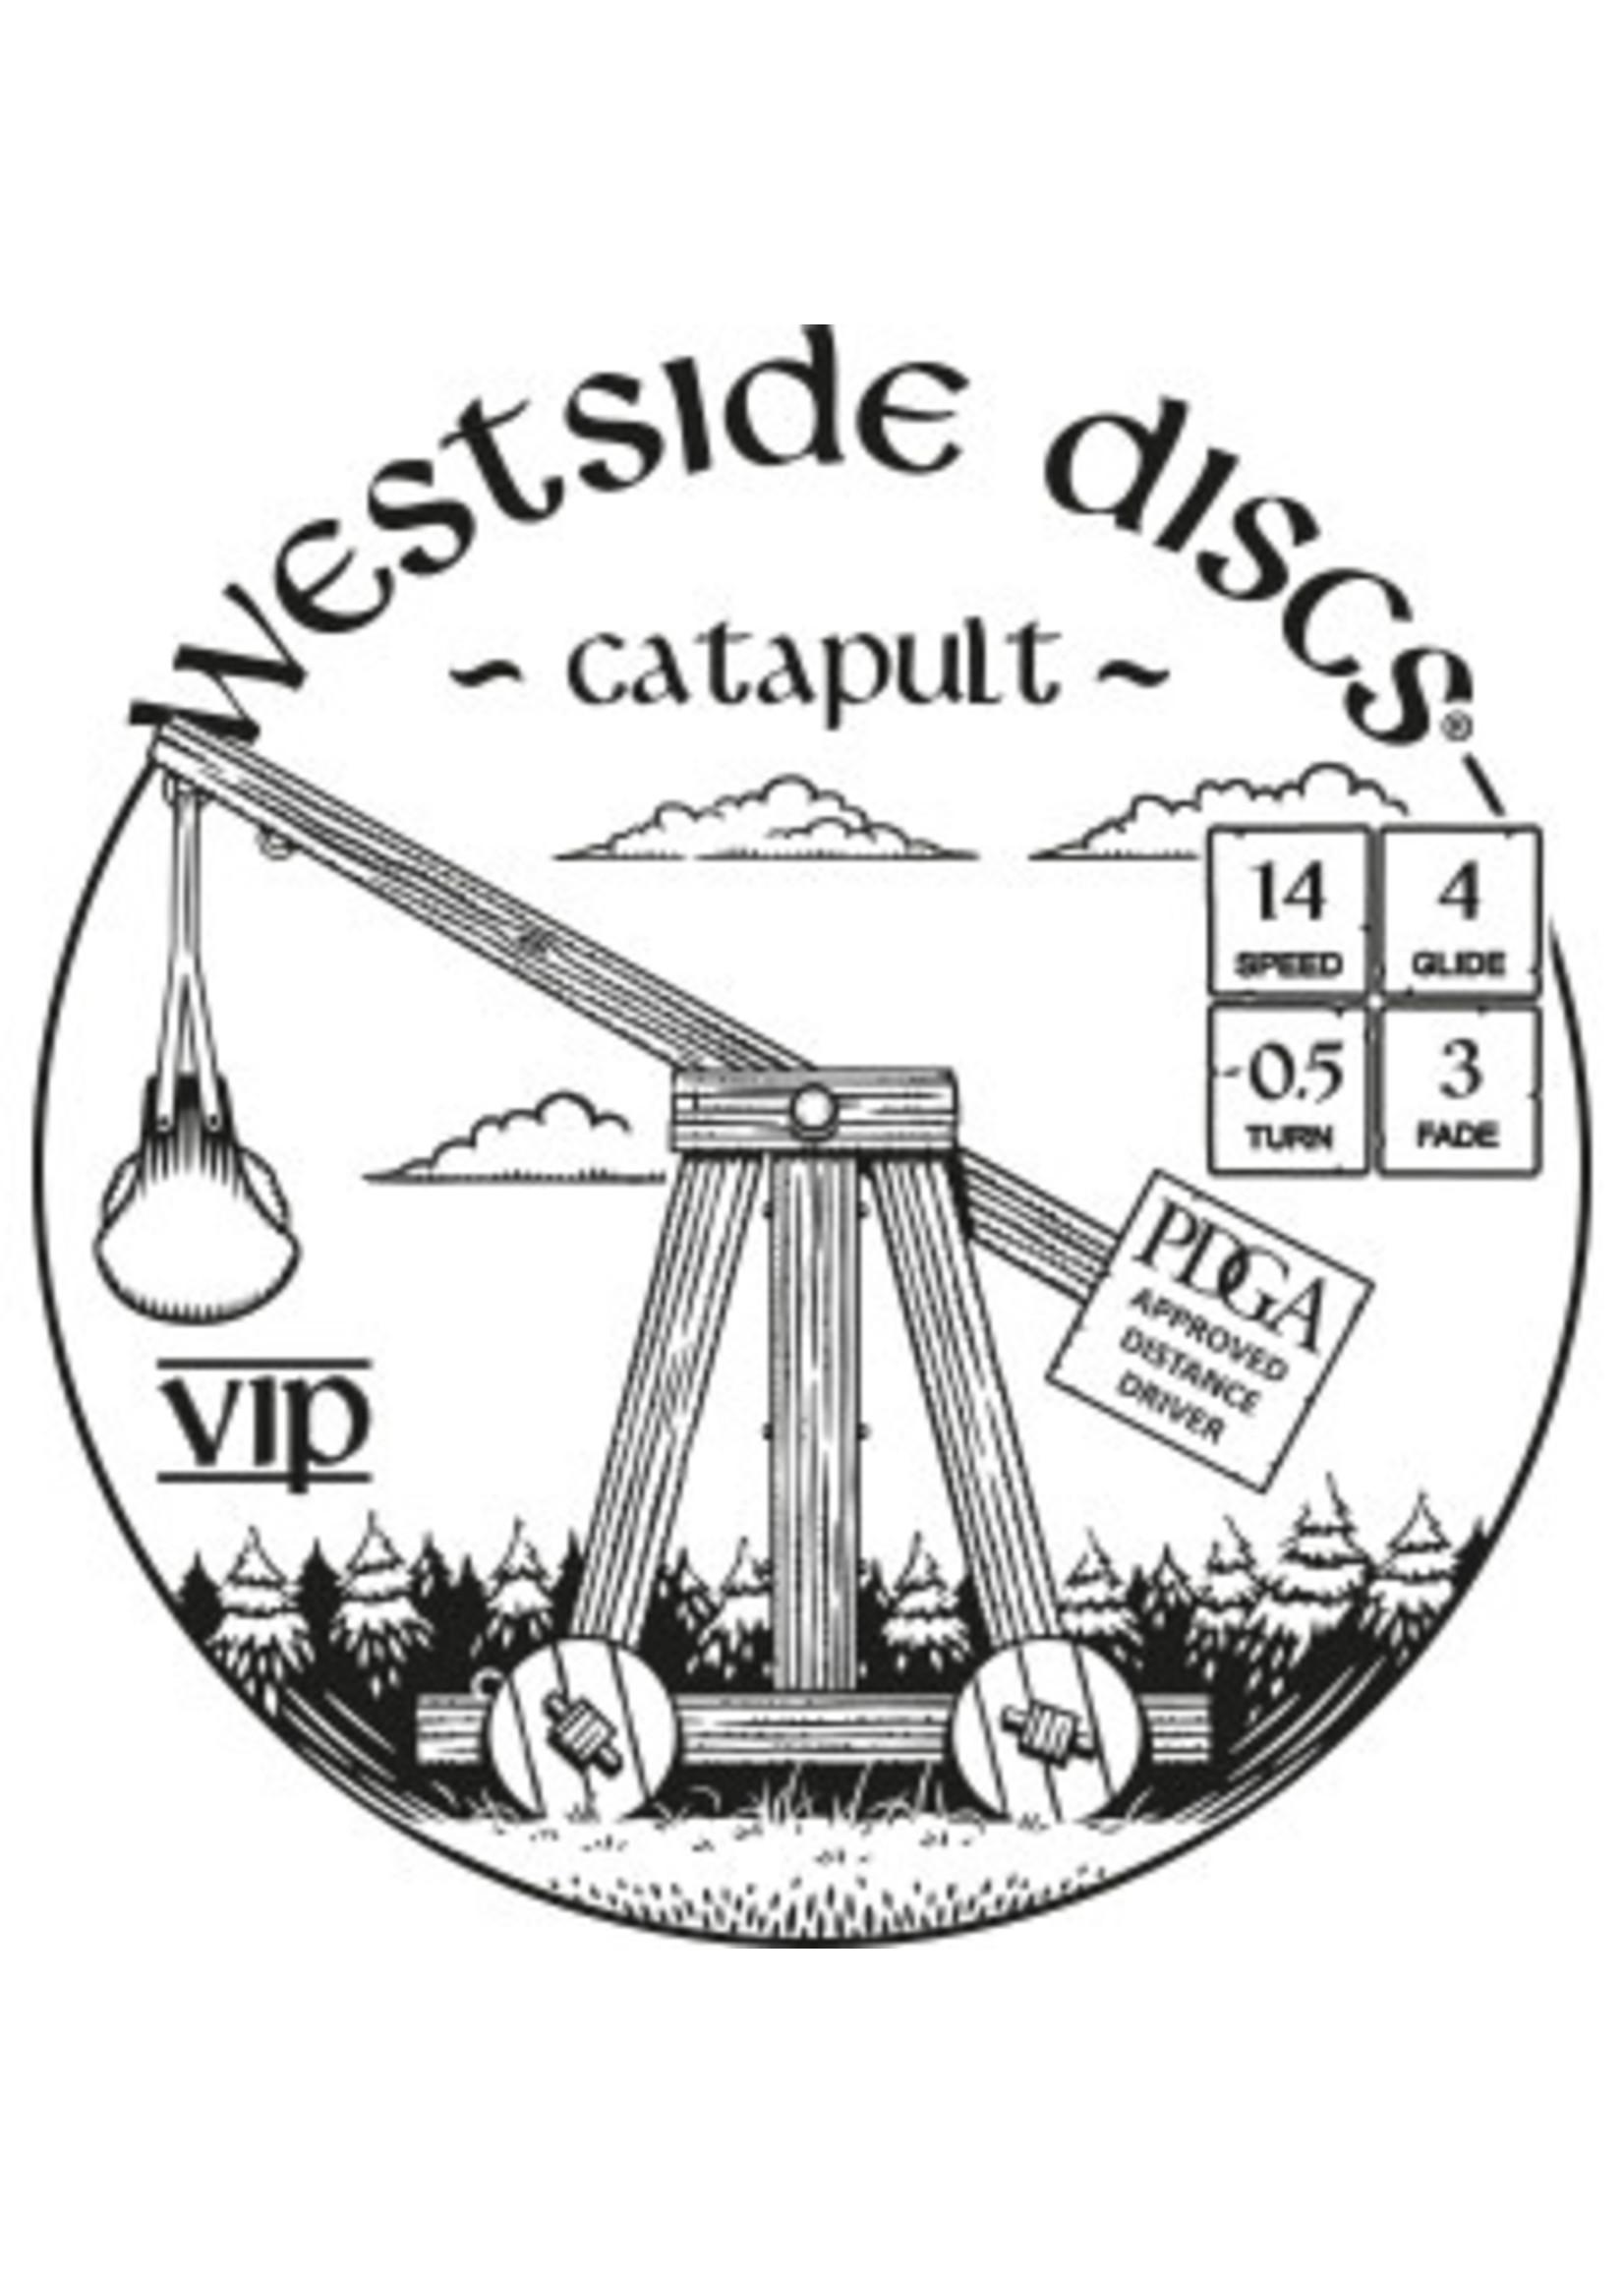 Westside Discs Westside Discs Catapult